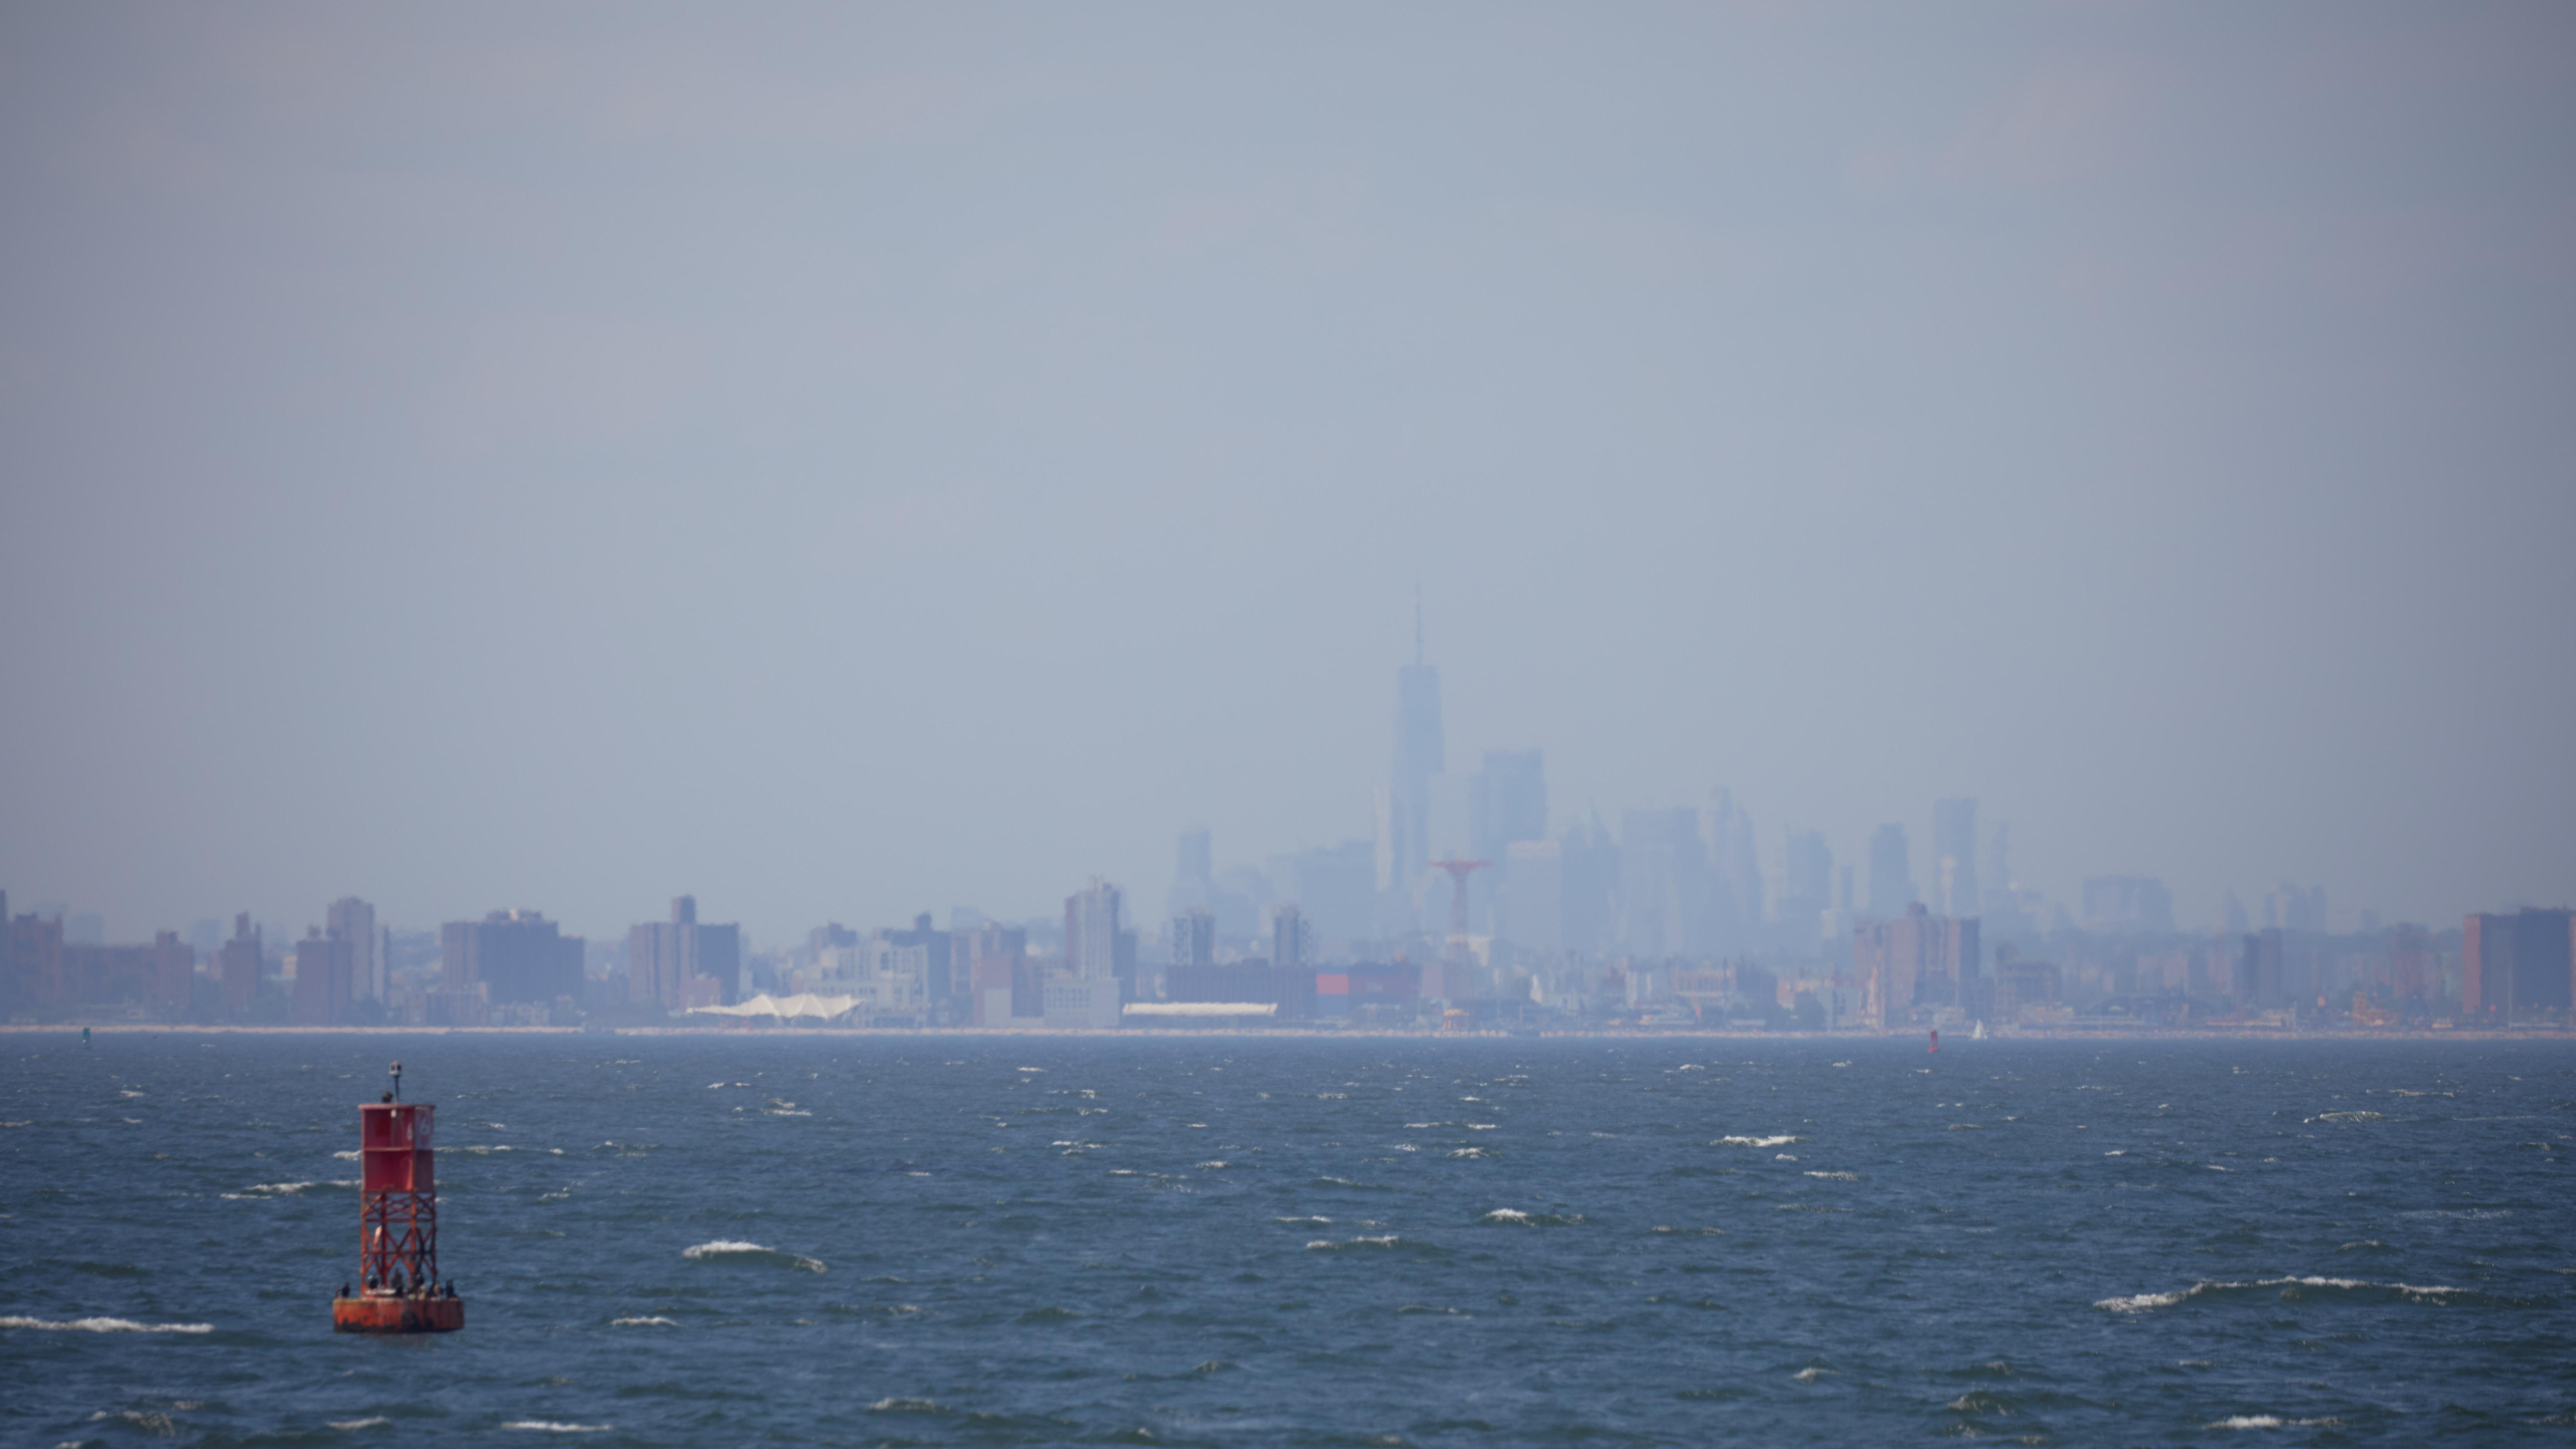 View of Manhattan skyline covered in haze.